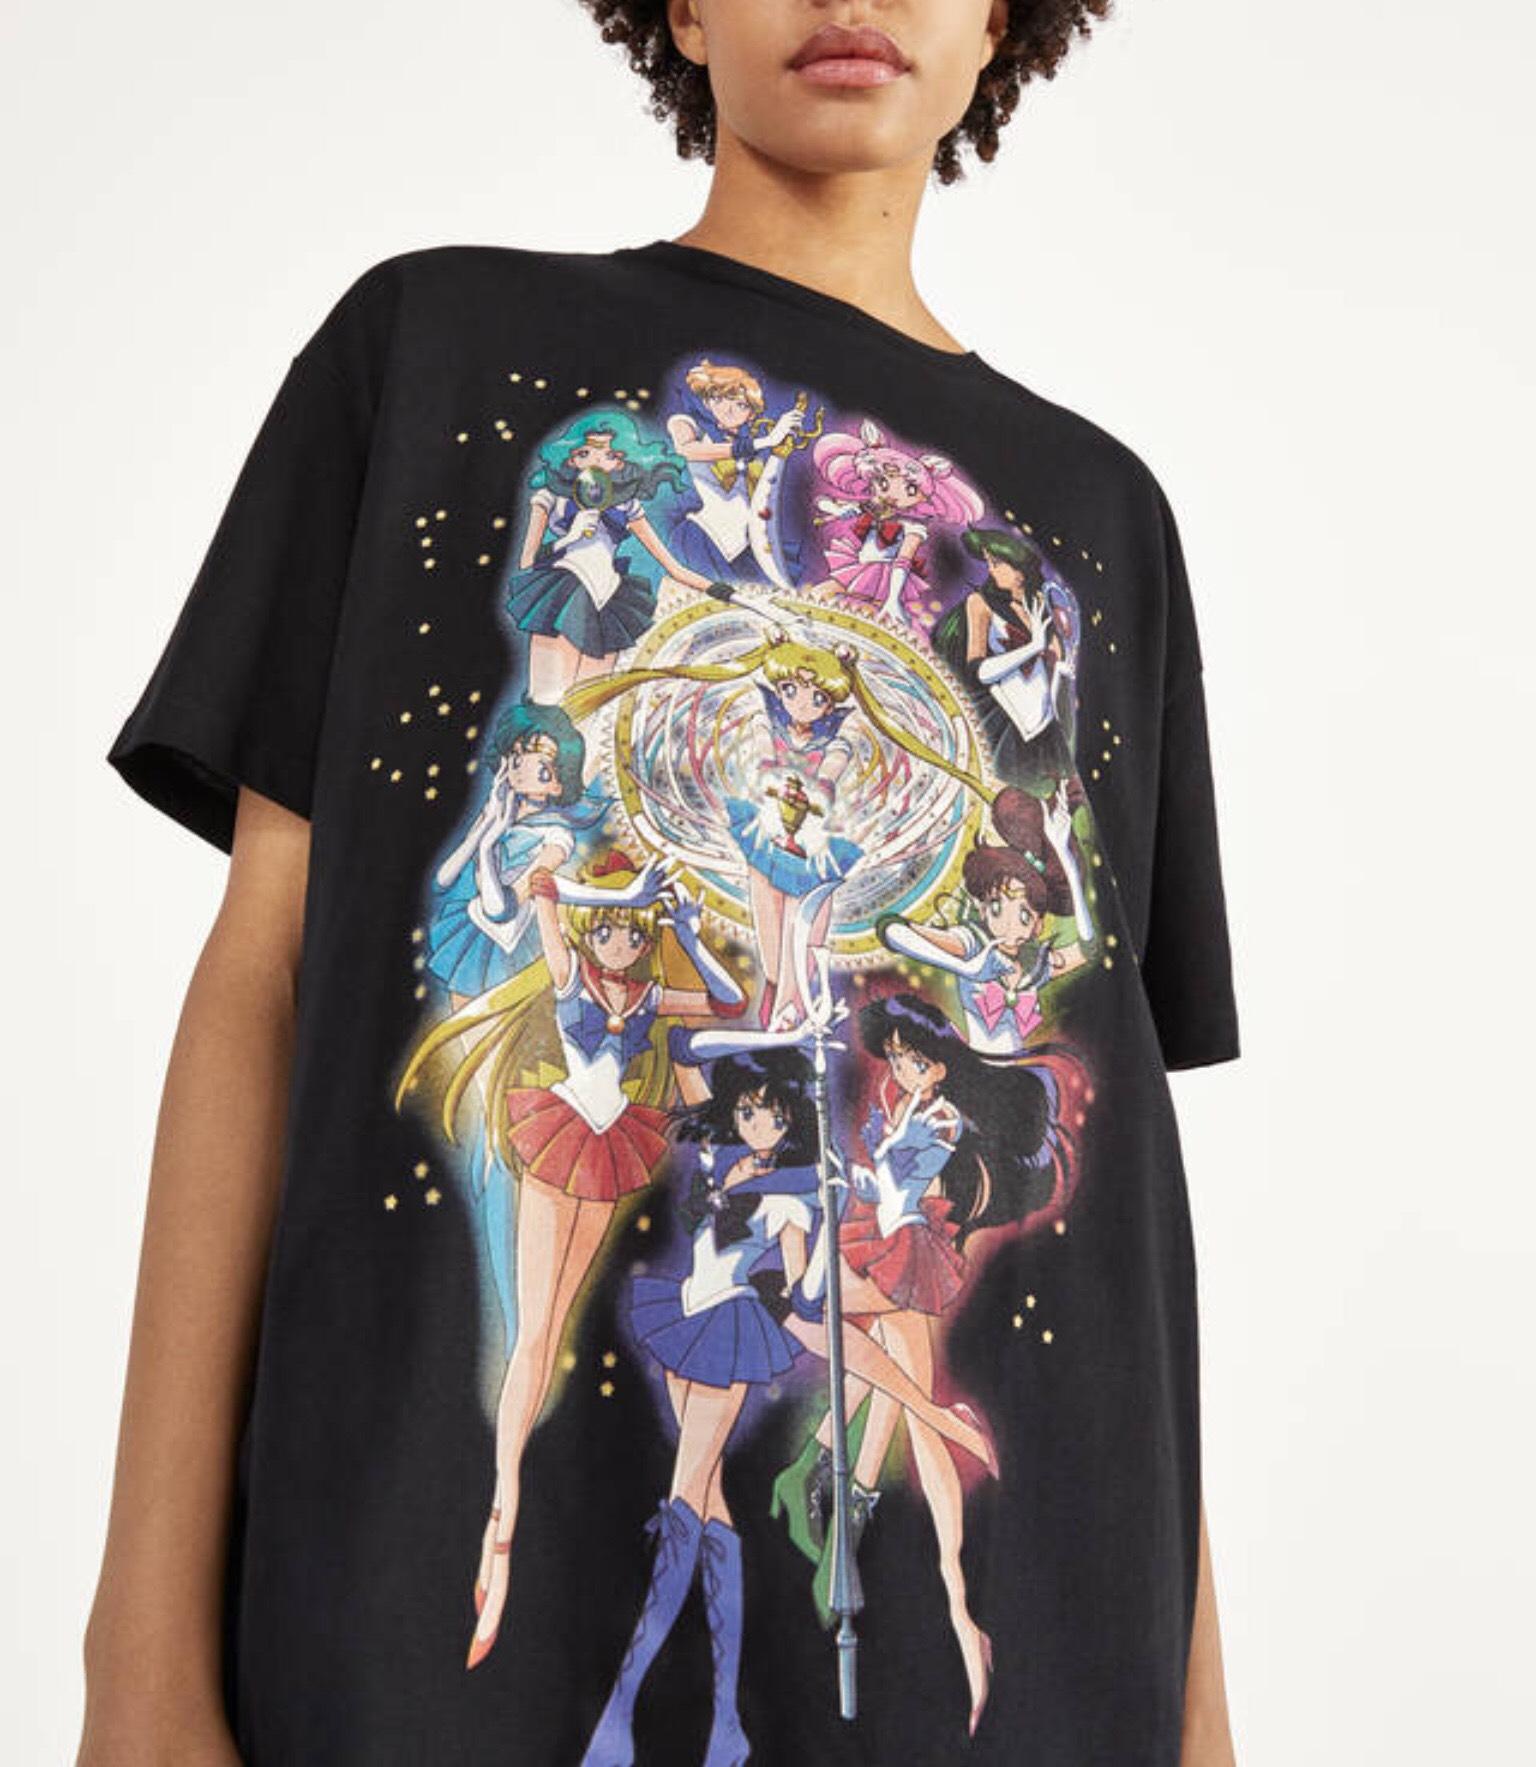 Camiseta de Sailor Moon a 8,99 en Bershka!